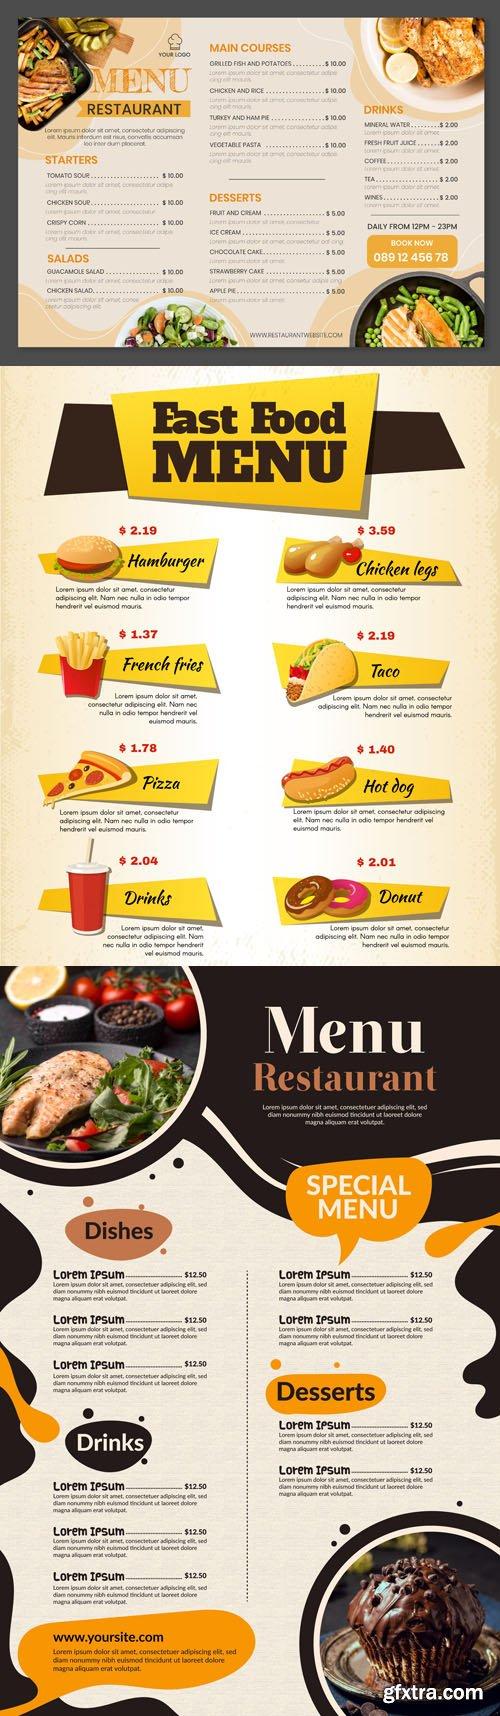 7 Creative Restaurant Menus - Vector Templates